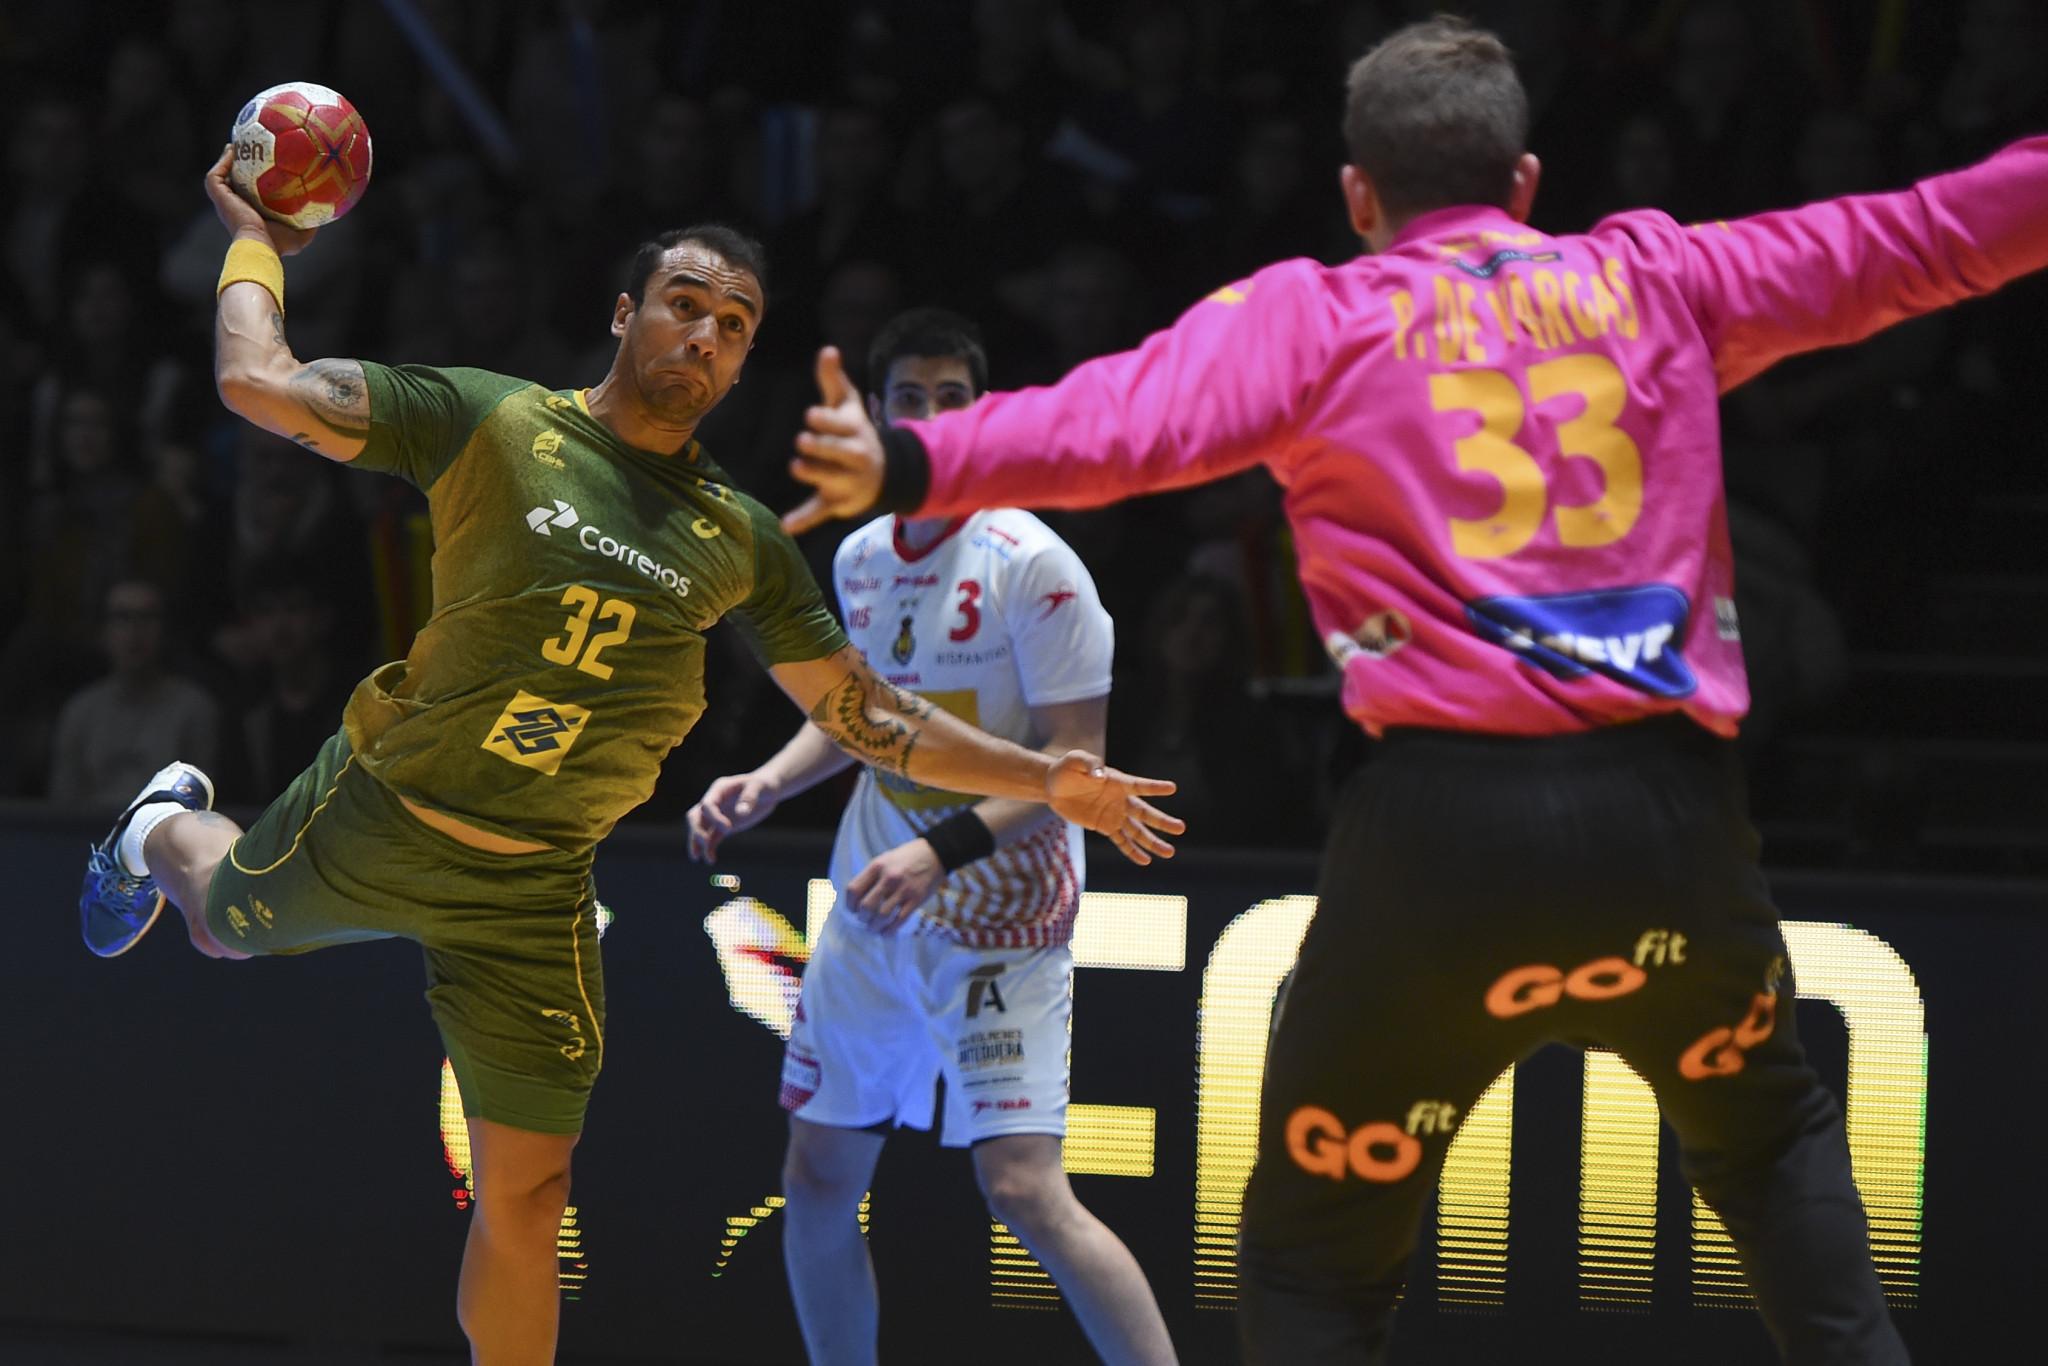 Holders Brazil maintain 100 per cent record at Pan American Men's Handball Championship